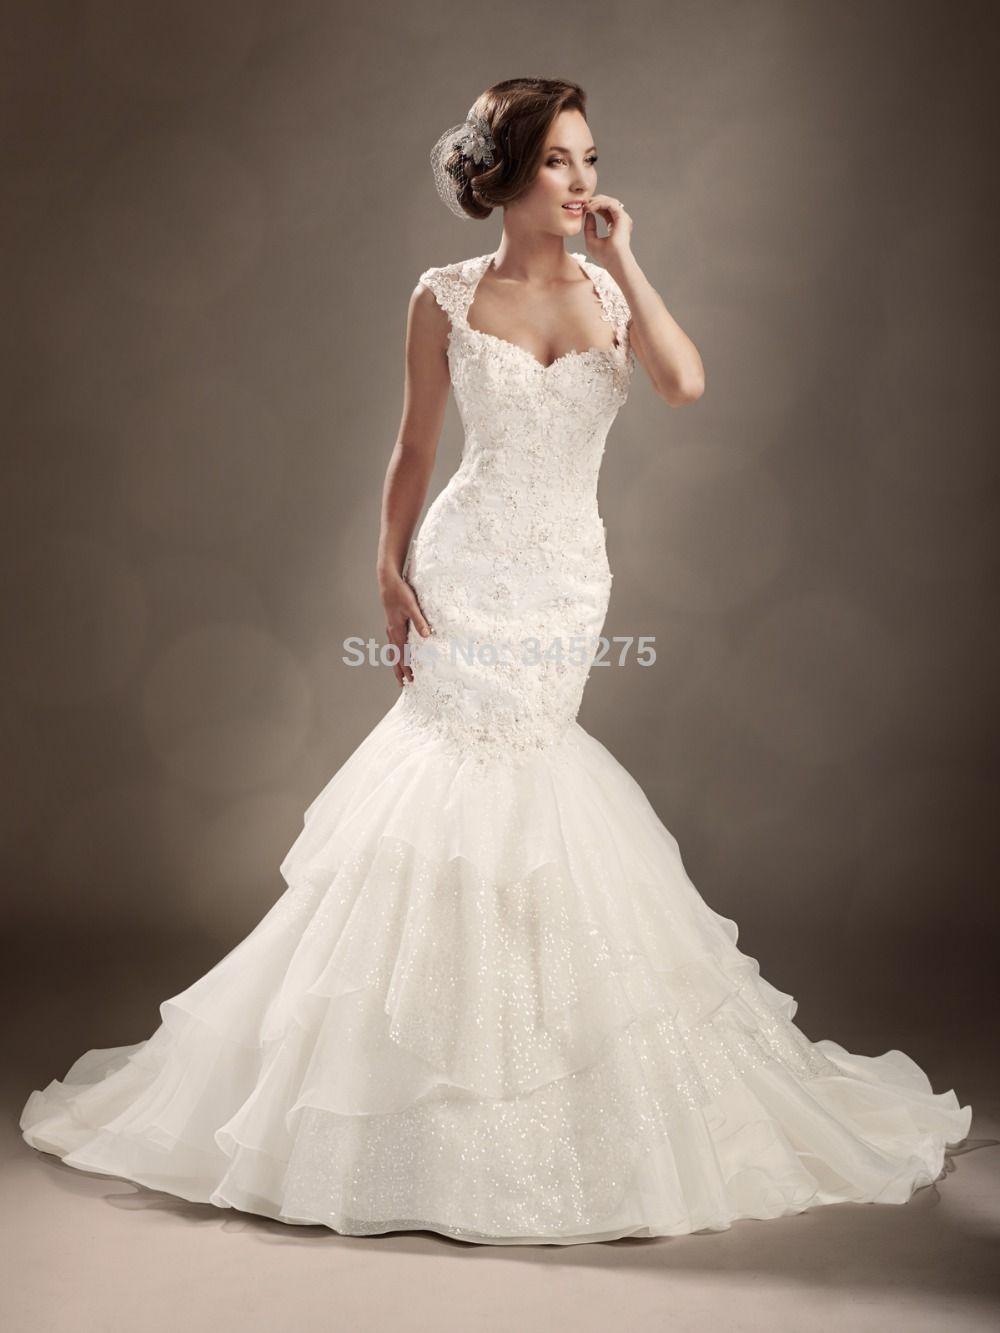 Cheap online designer wedding dresses, Buy Quality dress ...